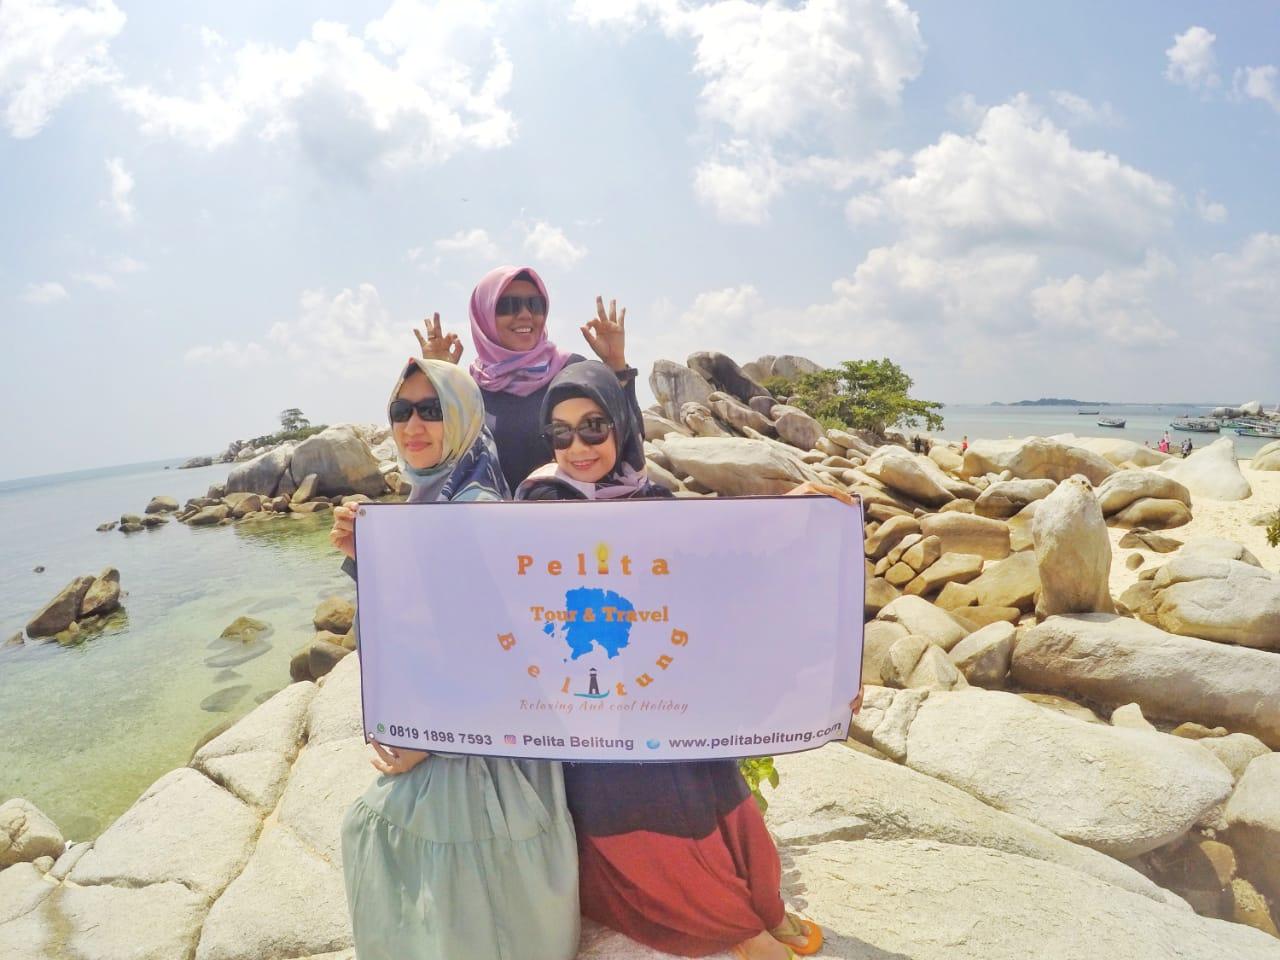 Paket Tour Belitung 2d1n Wisata Pelita Trip Pulau Pelangi 2d 1n Non Dive